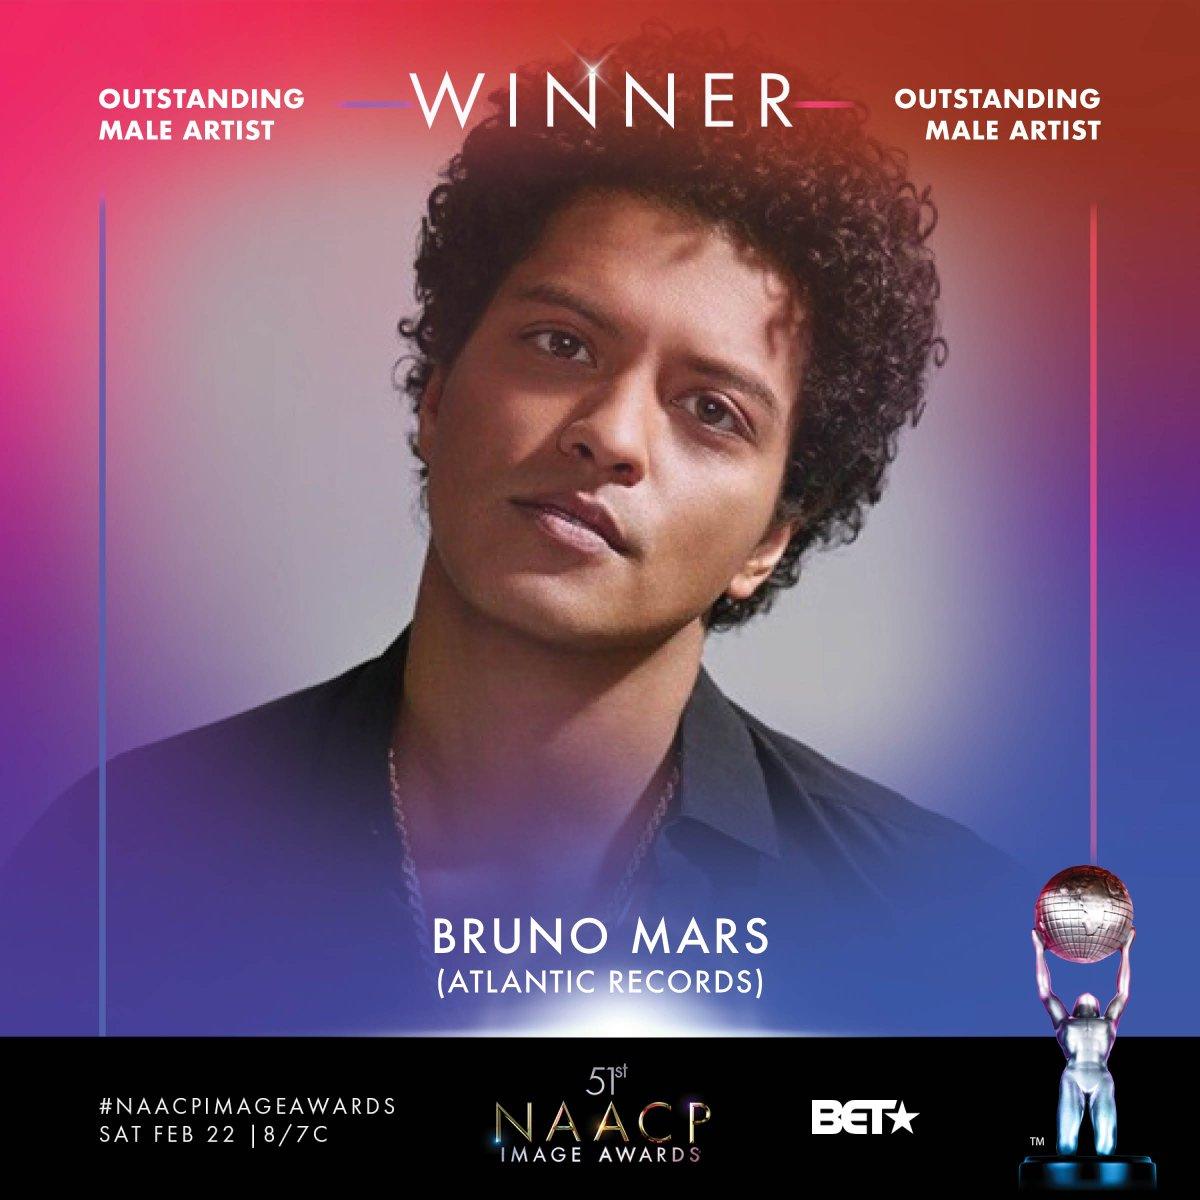 Congrats Outstanding Male Artist winner - @brunomars #NAACPImageAwards